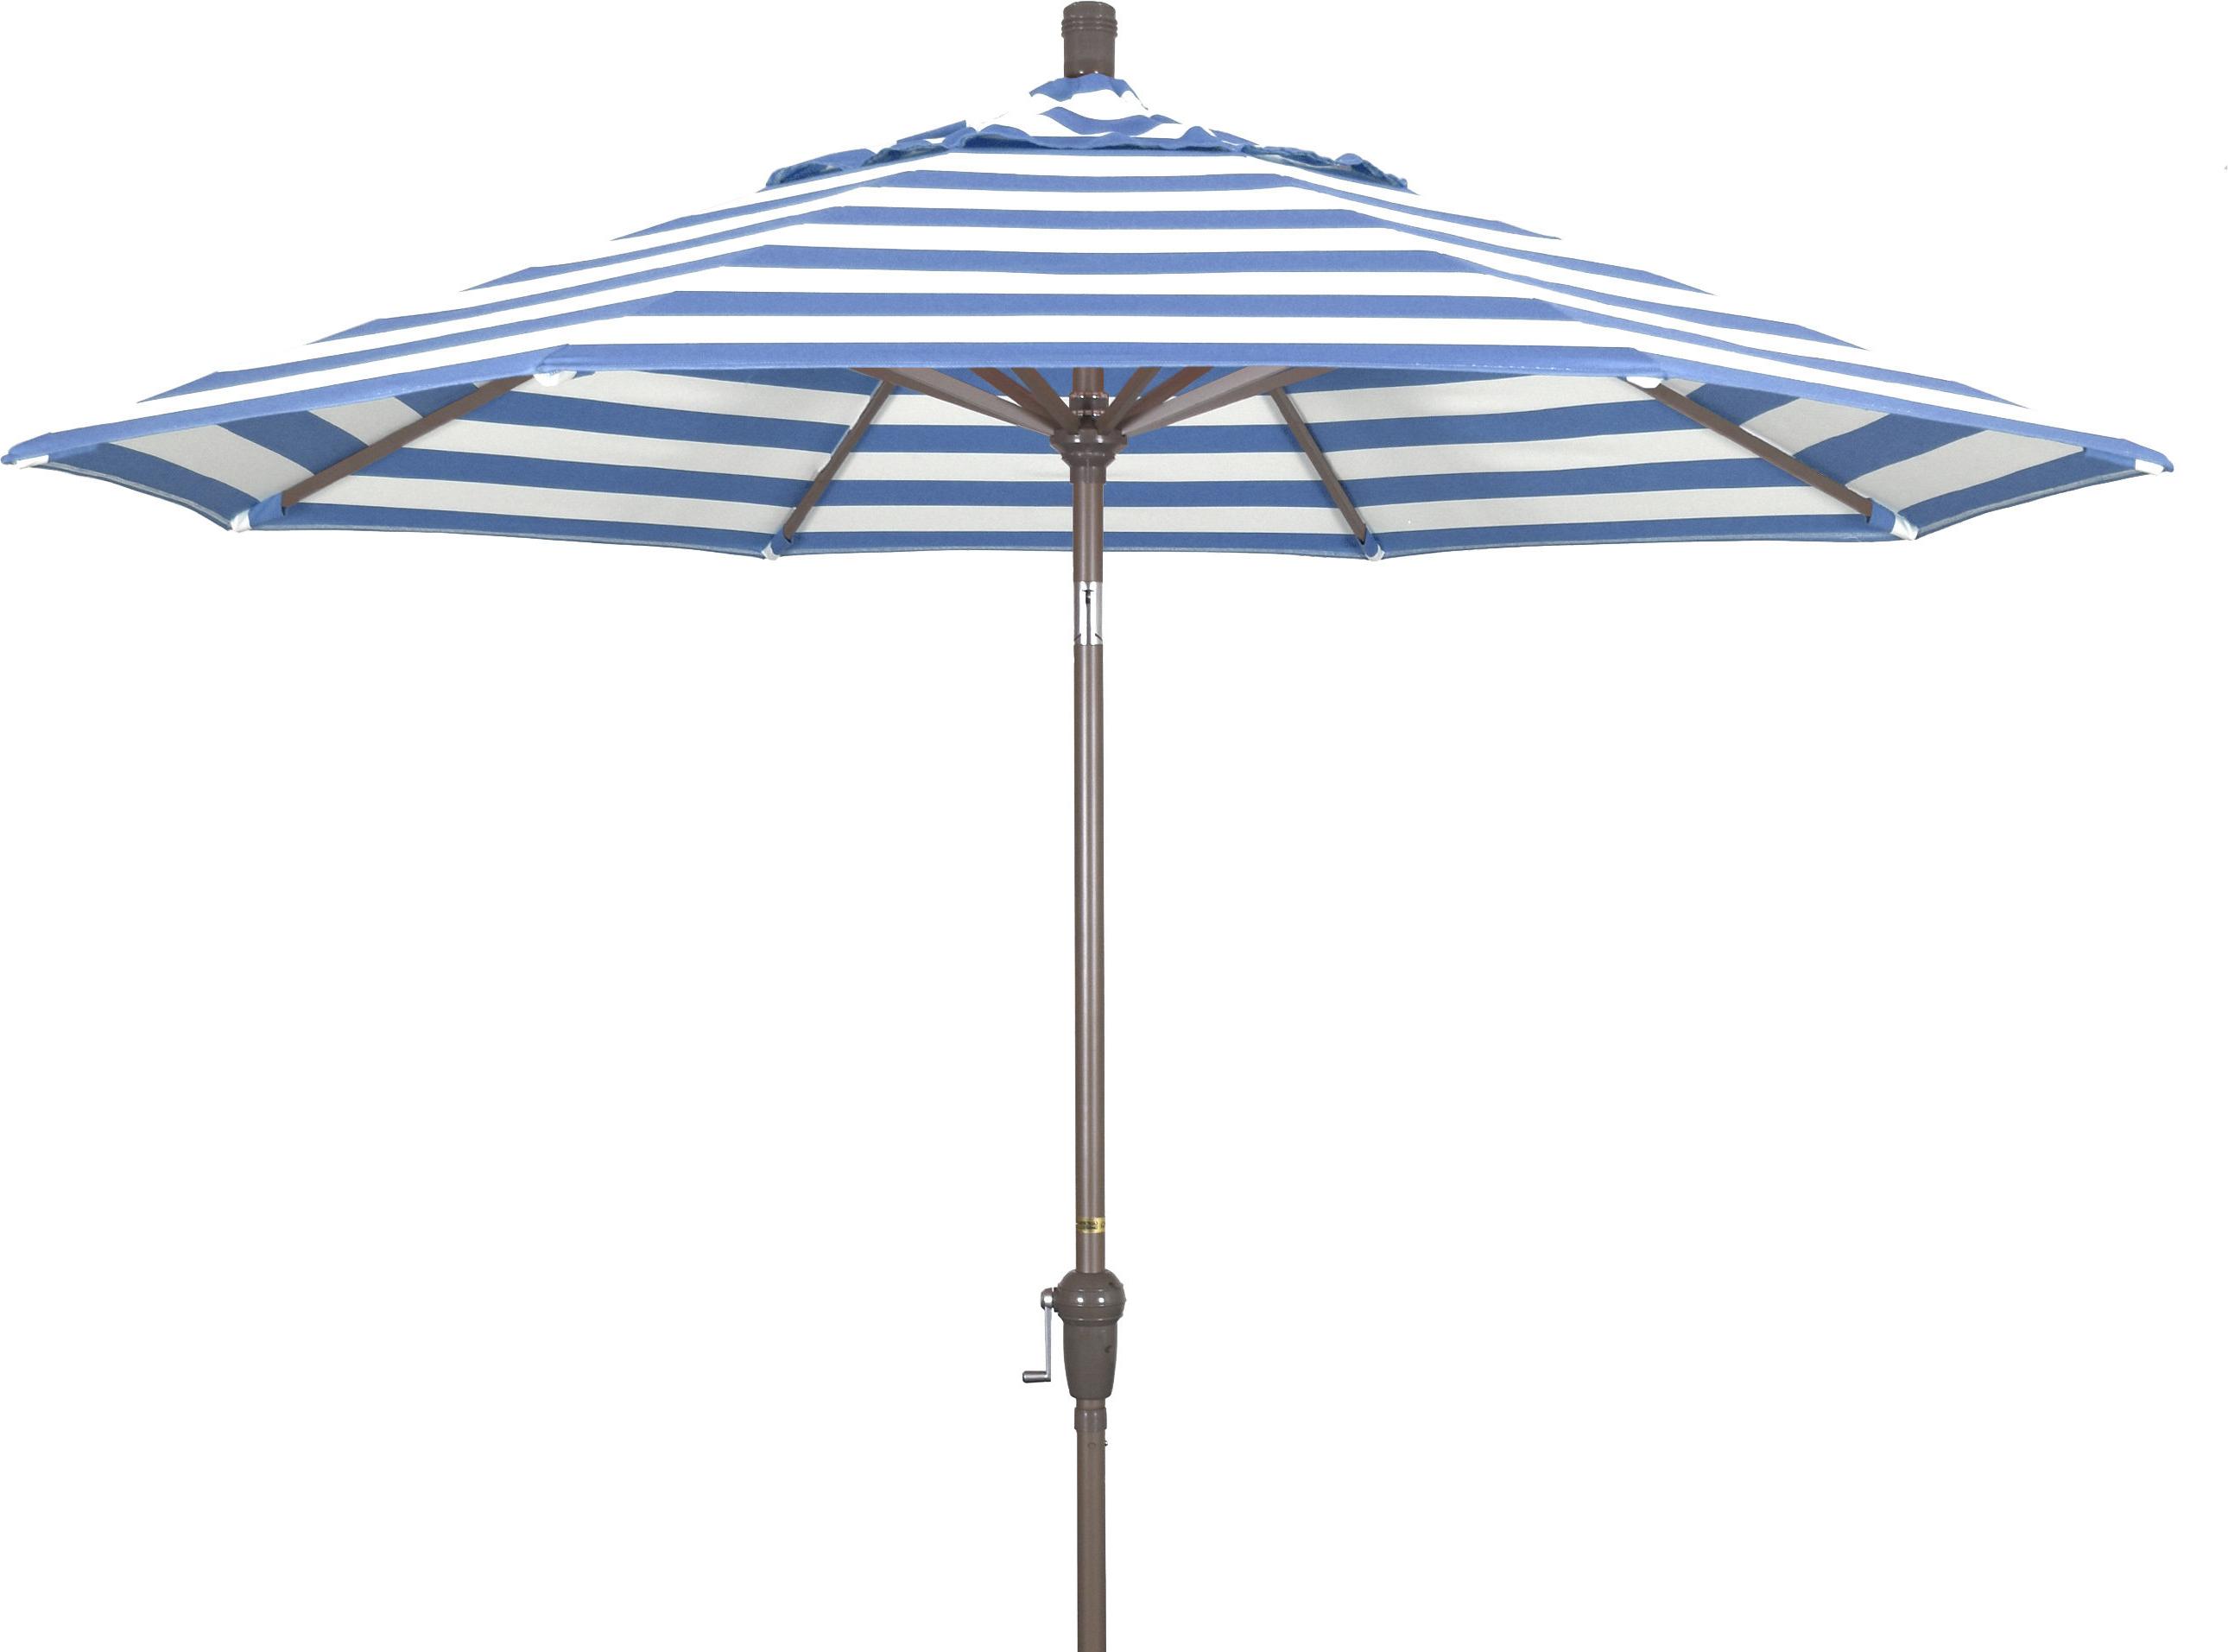 9' Market Sunbrella Umbrella Intended For Well Known Mullaney Market Sunbrella Umbrellas (View 13 of 20)